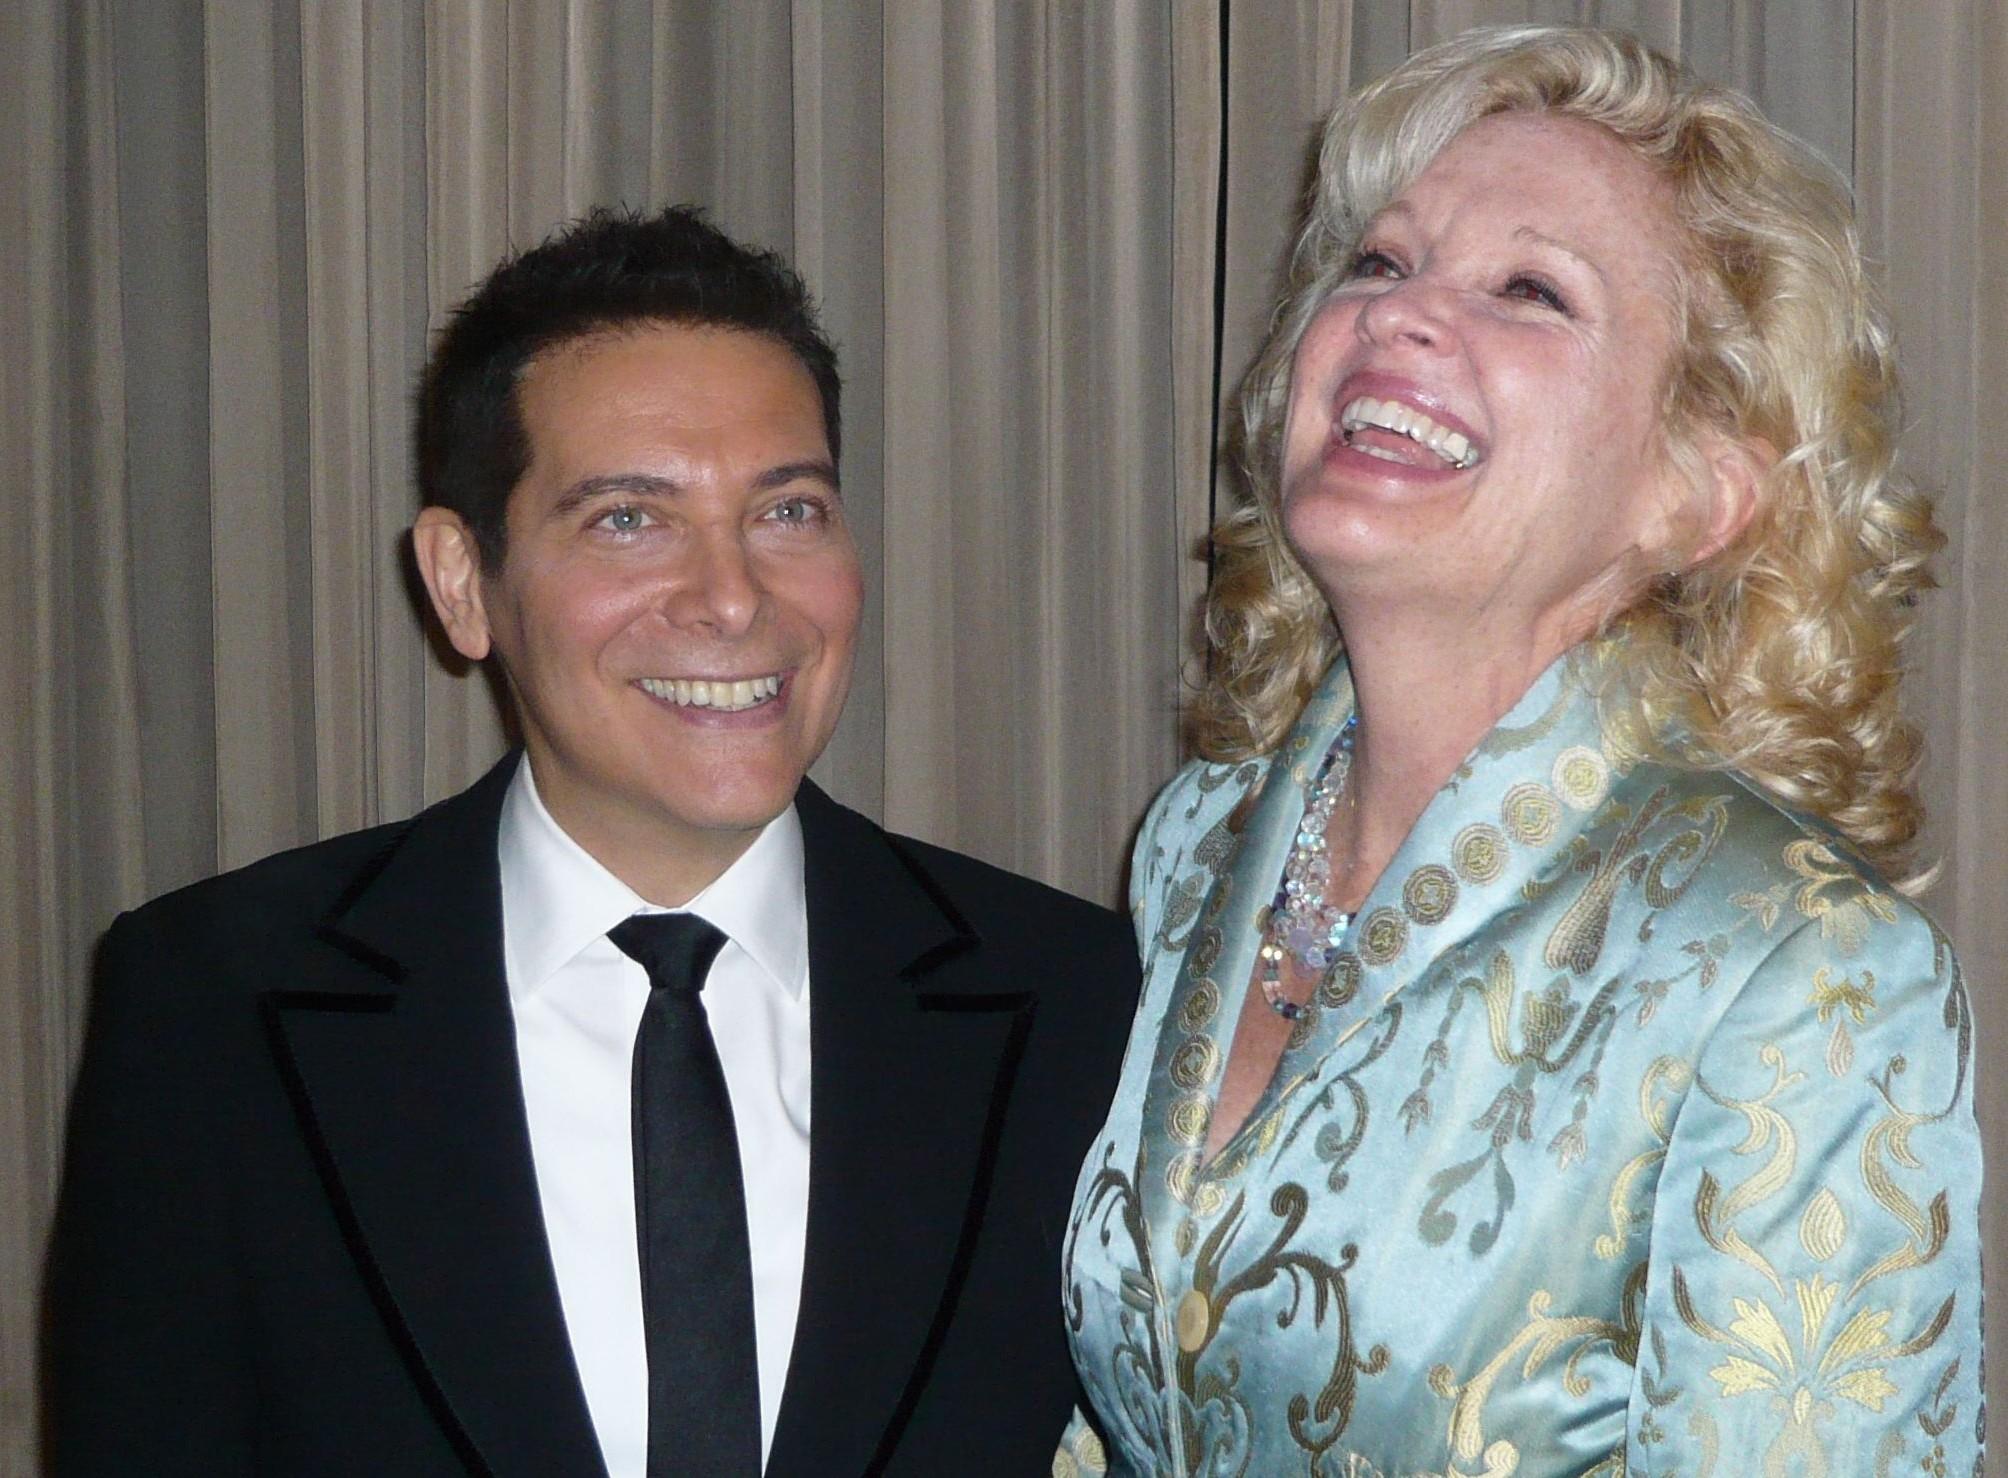 Michael Feinstein and Christine Ebersole Photo by Gacin1